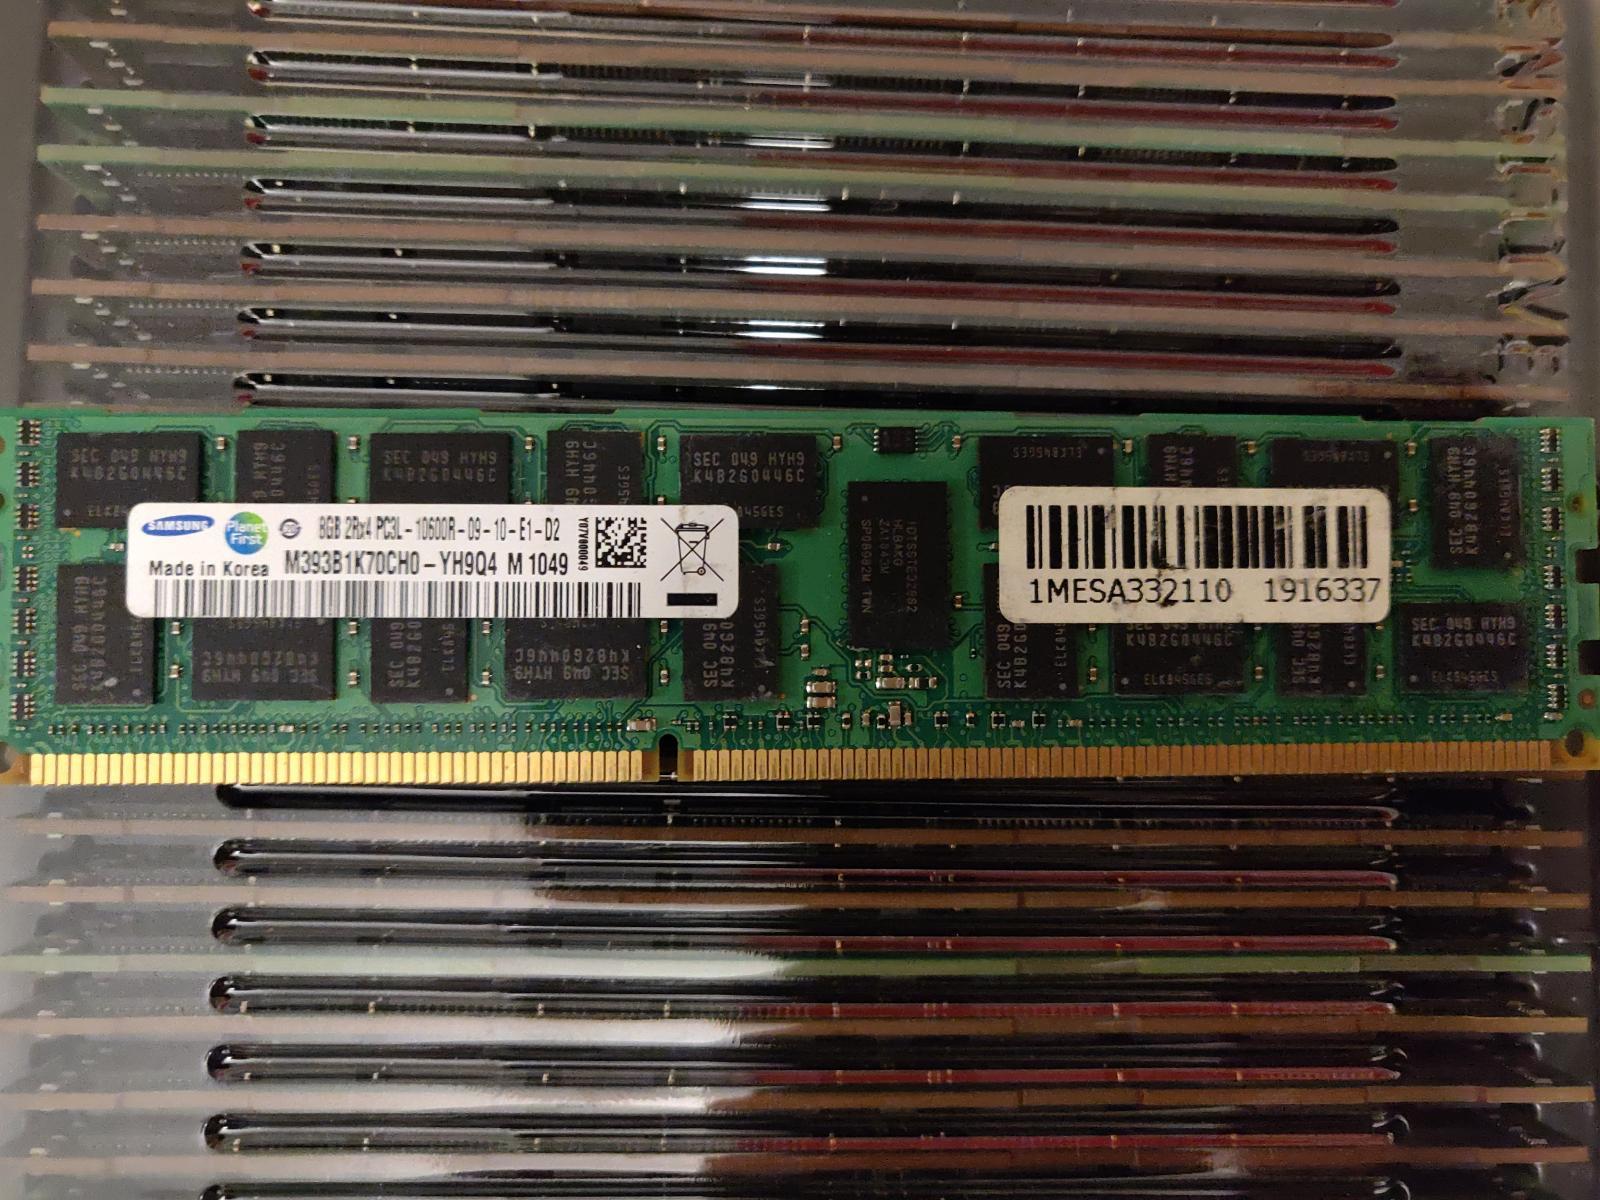 Photo of 8GB DDR3 ECC SERVER RAM Memory Sticks